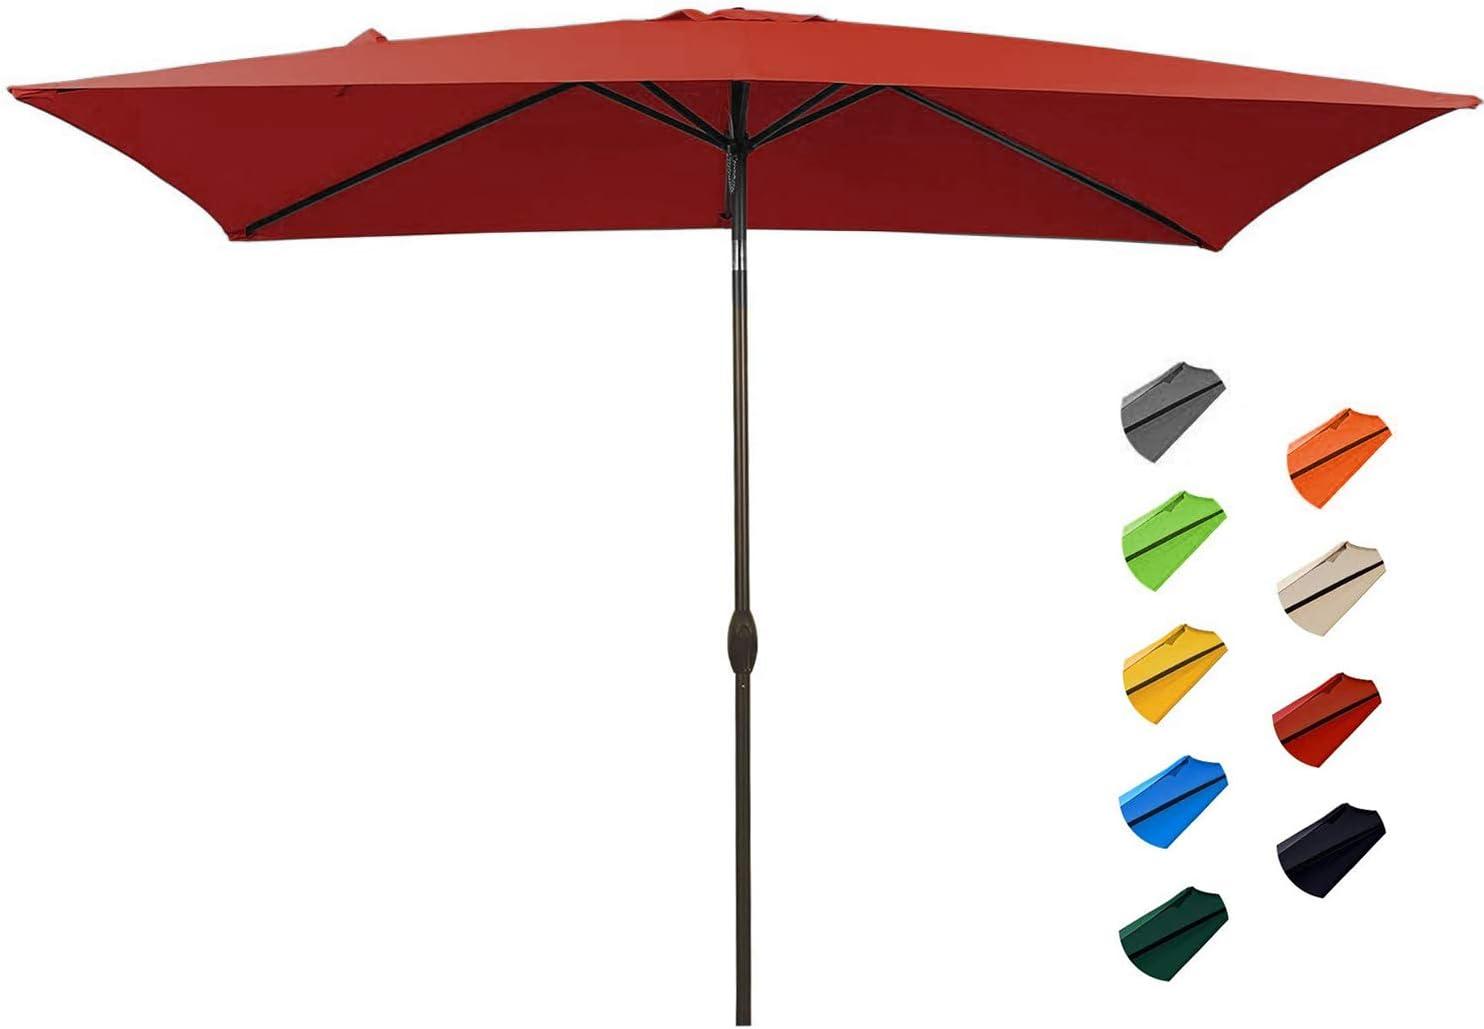 KITADIN Rectangular Patio Umbrella